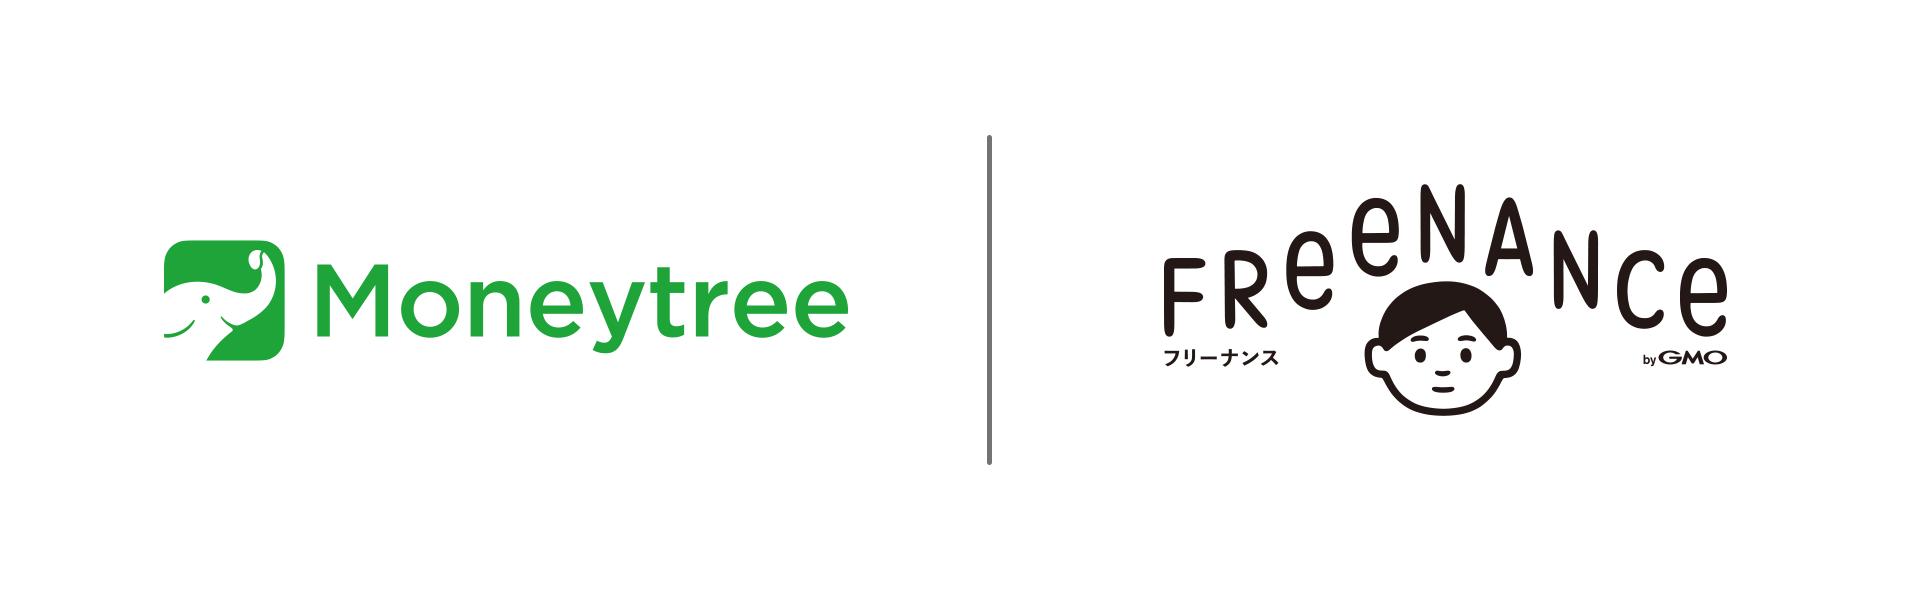 Partnership-GMO FREENANCE